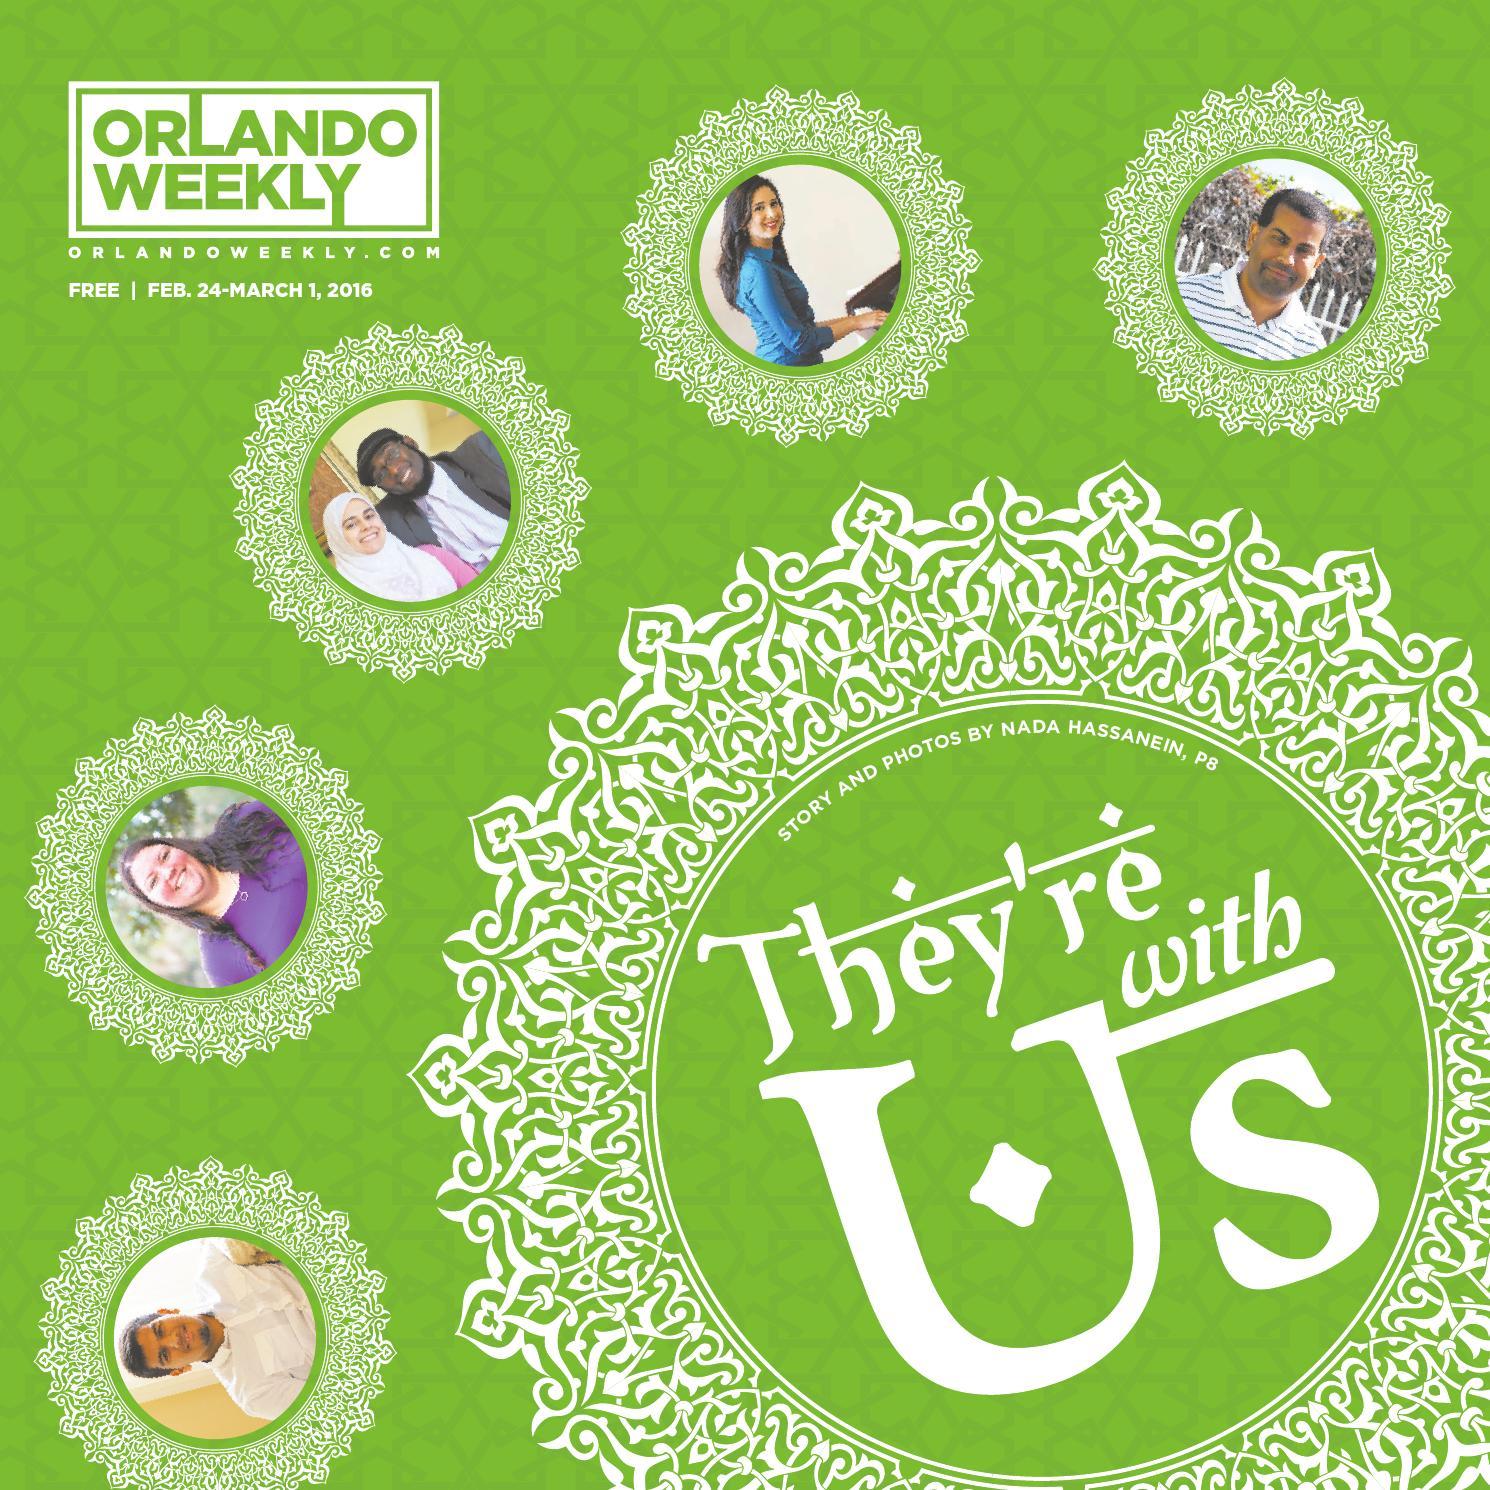 Orlando Weekly February 24, 2016 by Euclid Media Group - issuu